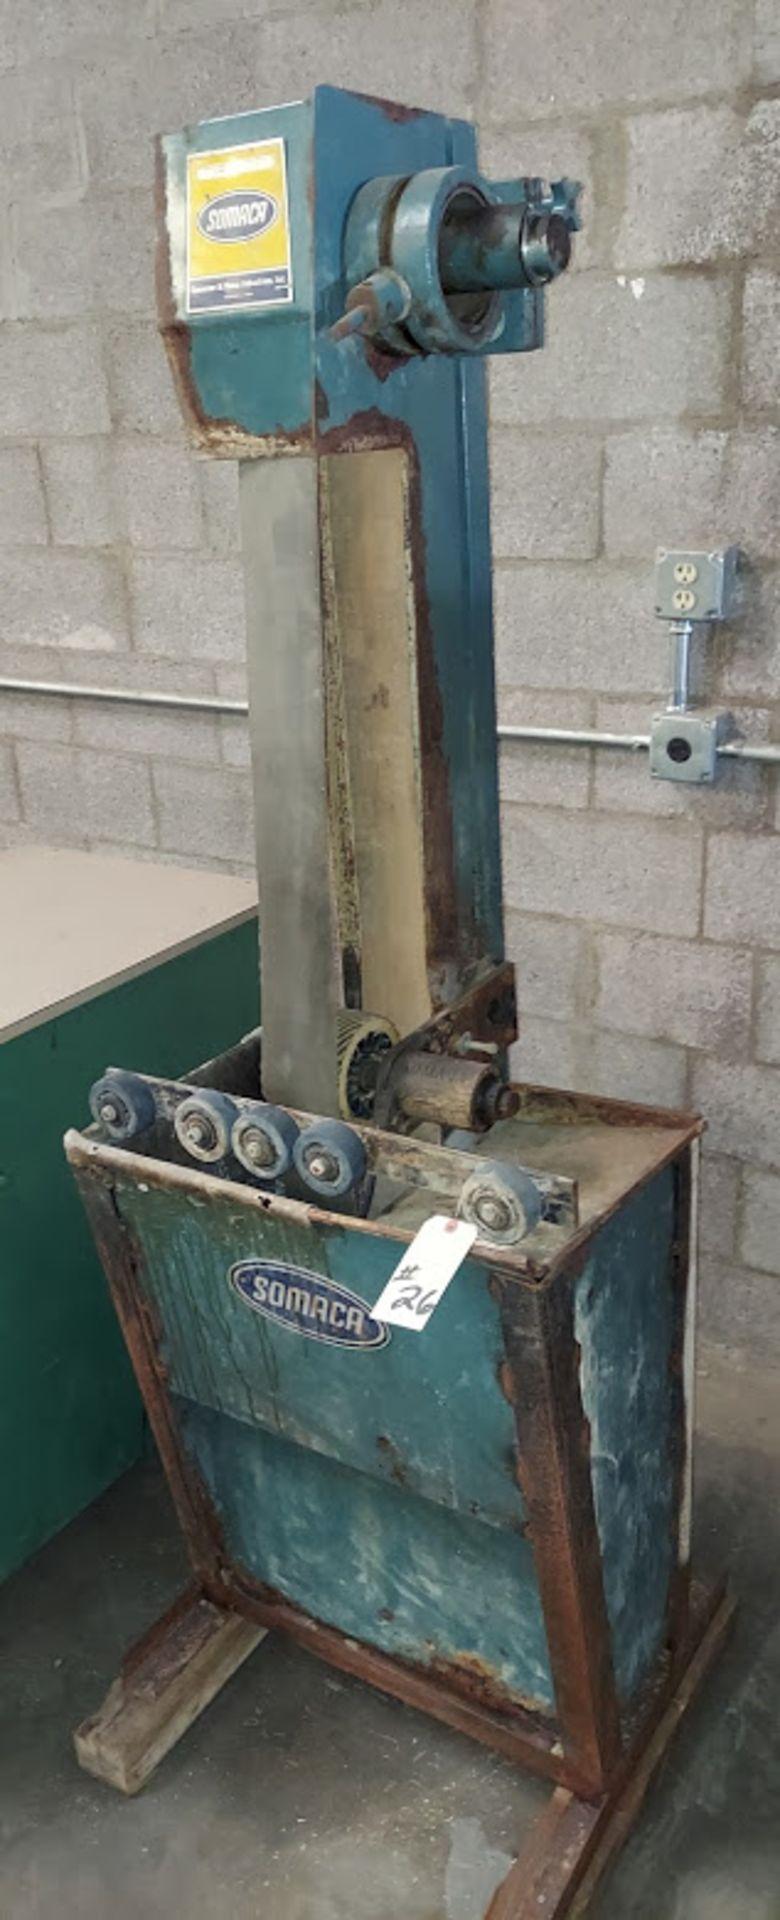 "Somaca 106"" Wet Abrasive Belt Machine with Roller Platen, Model # BM-1060-RP, 115 Volts"